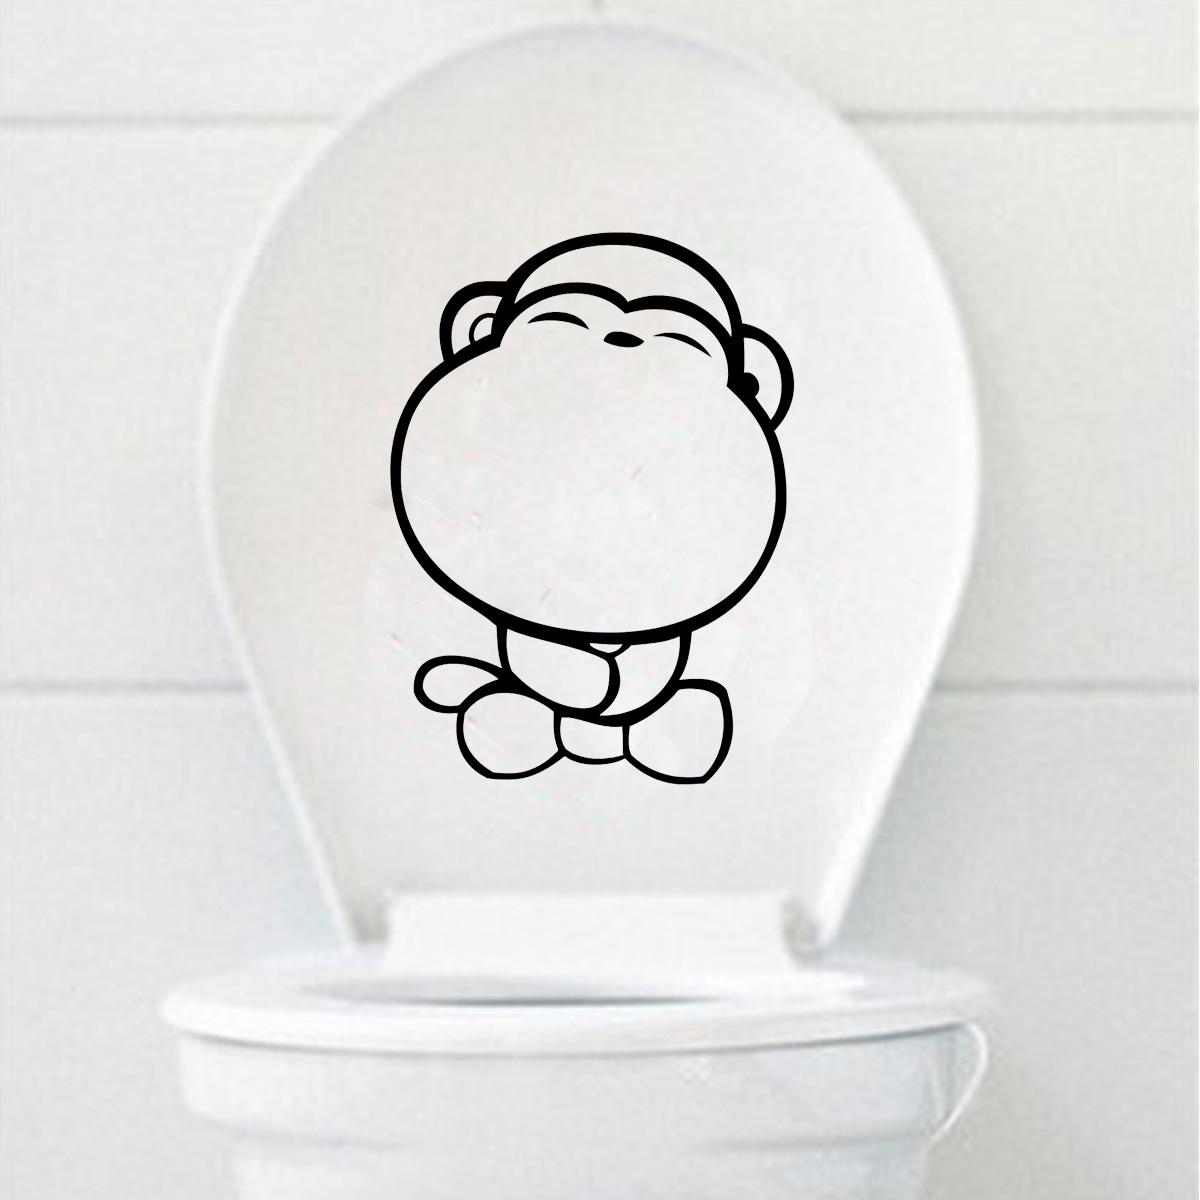 wandtattoo aufkleber wc klo deckel toilette bad t r. Black Bedroom Furniture Sets. Home Design Ideas